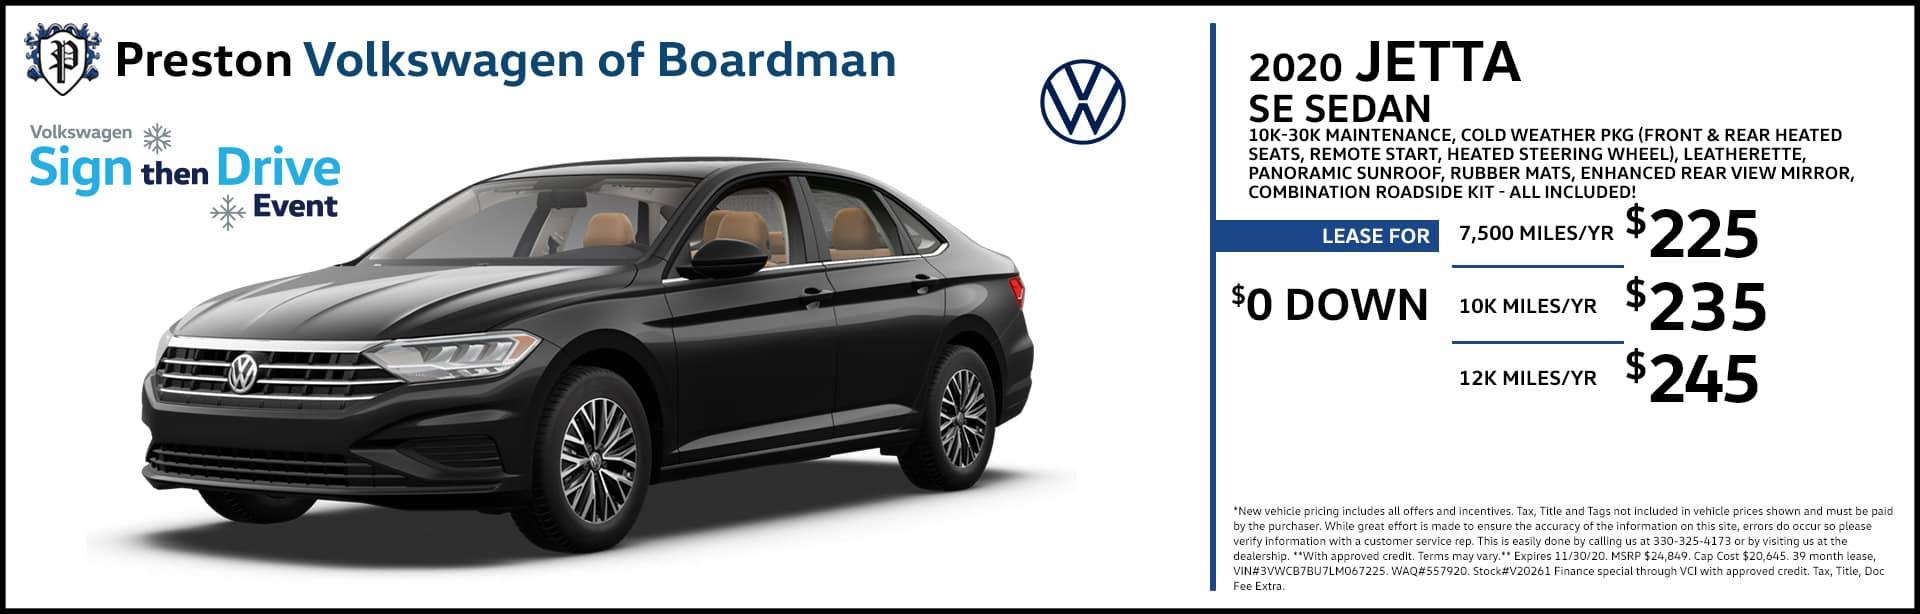 November special on the 2020 Volkswagen Jetta